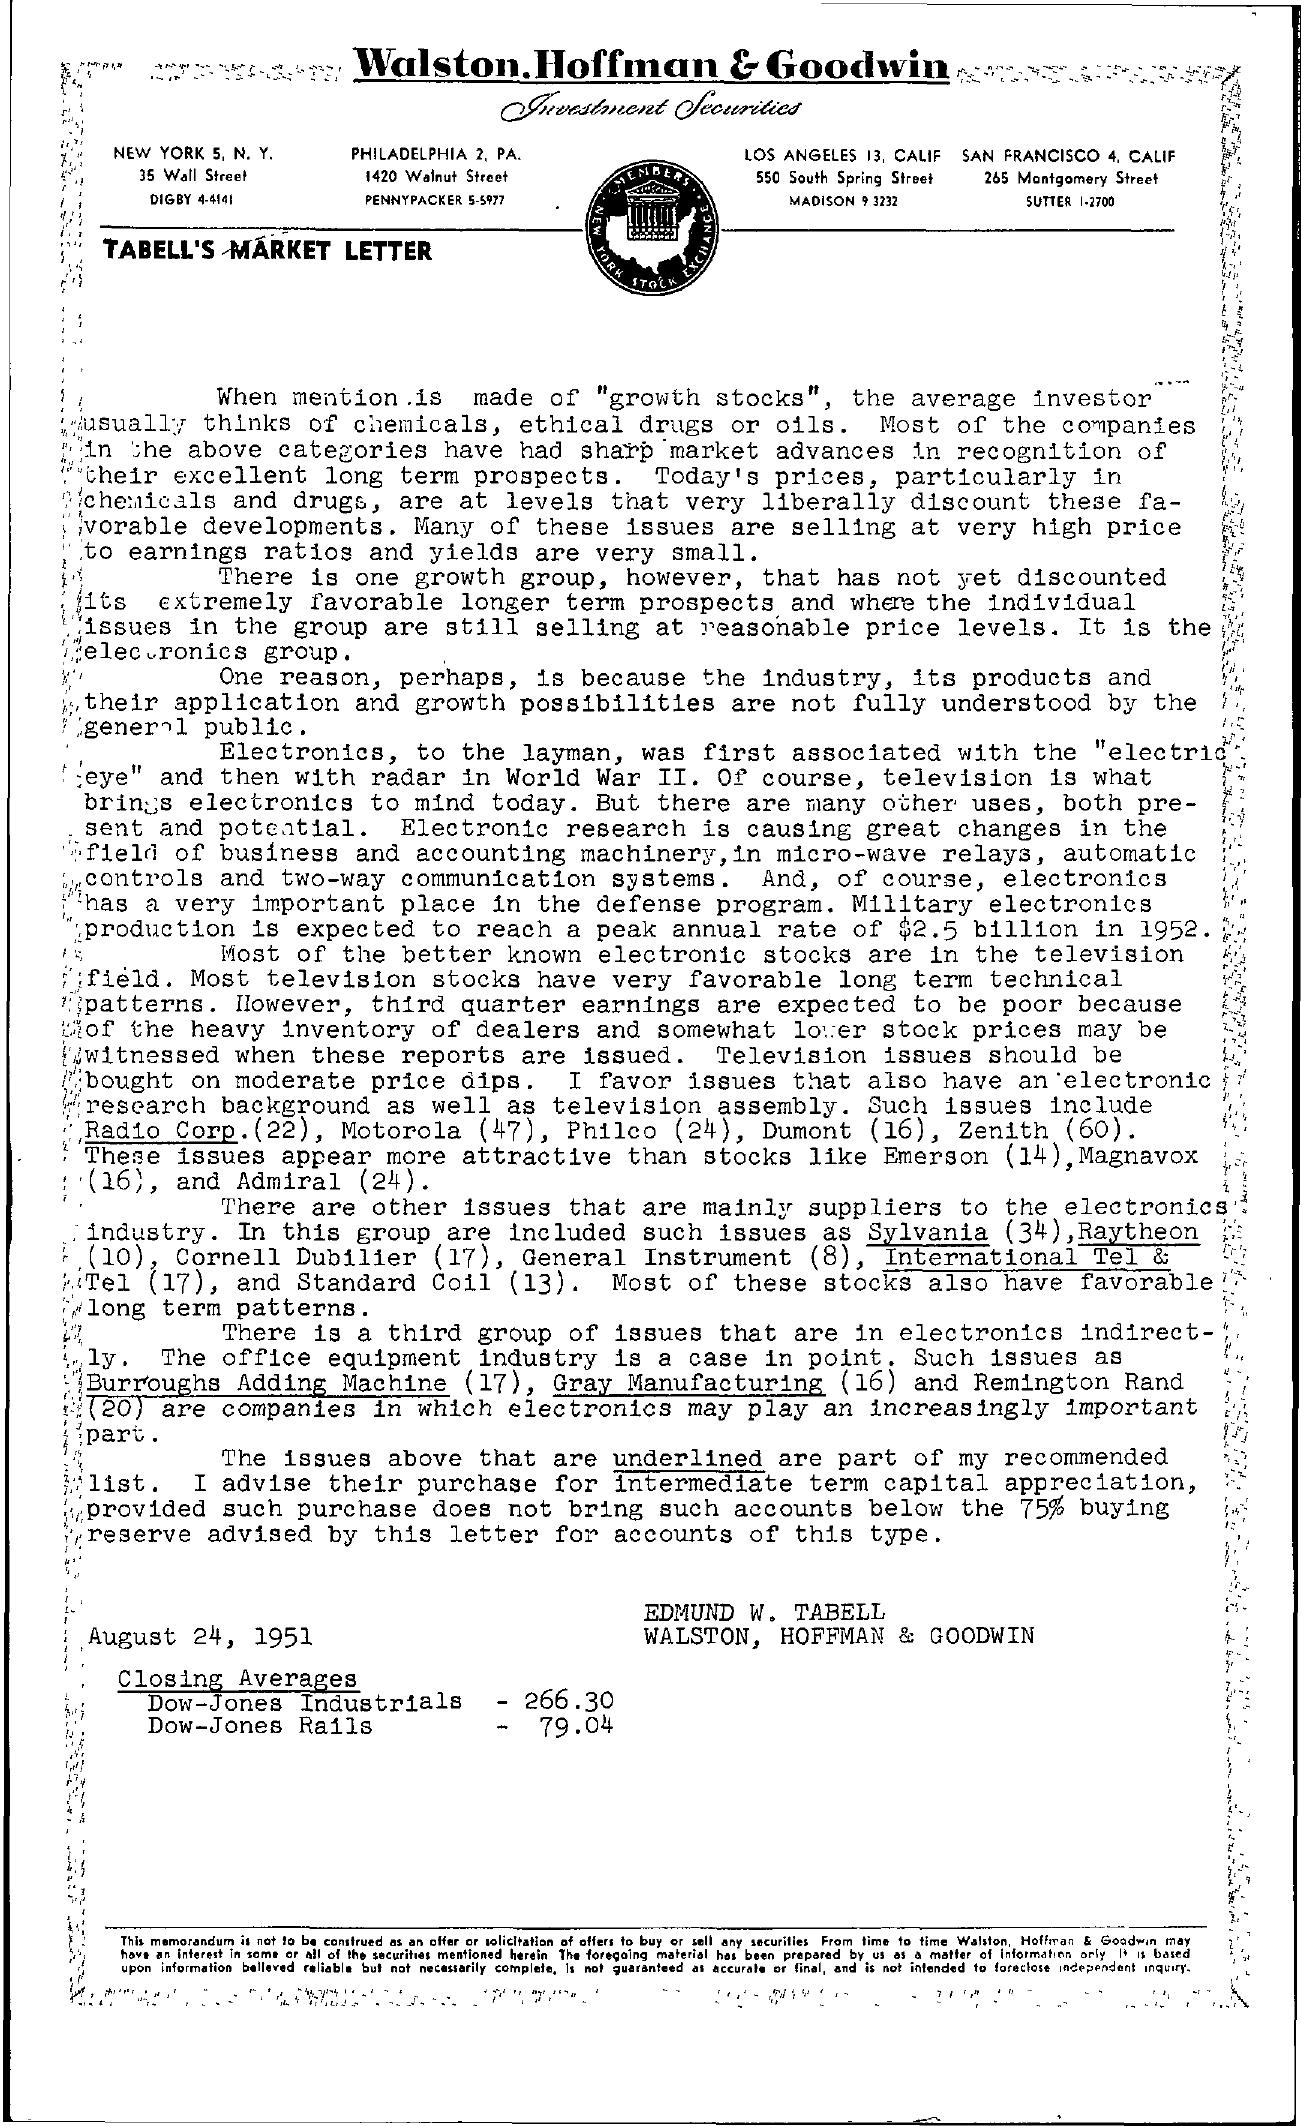 Tabell's Market Letter - August 24, 1951